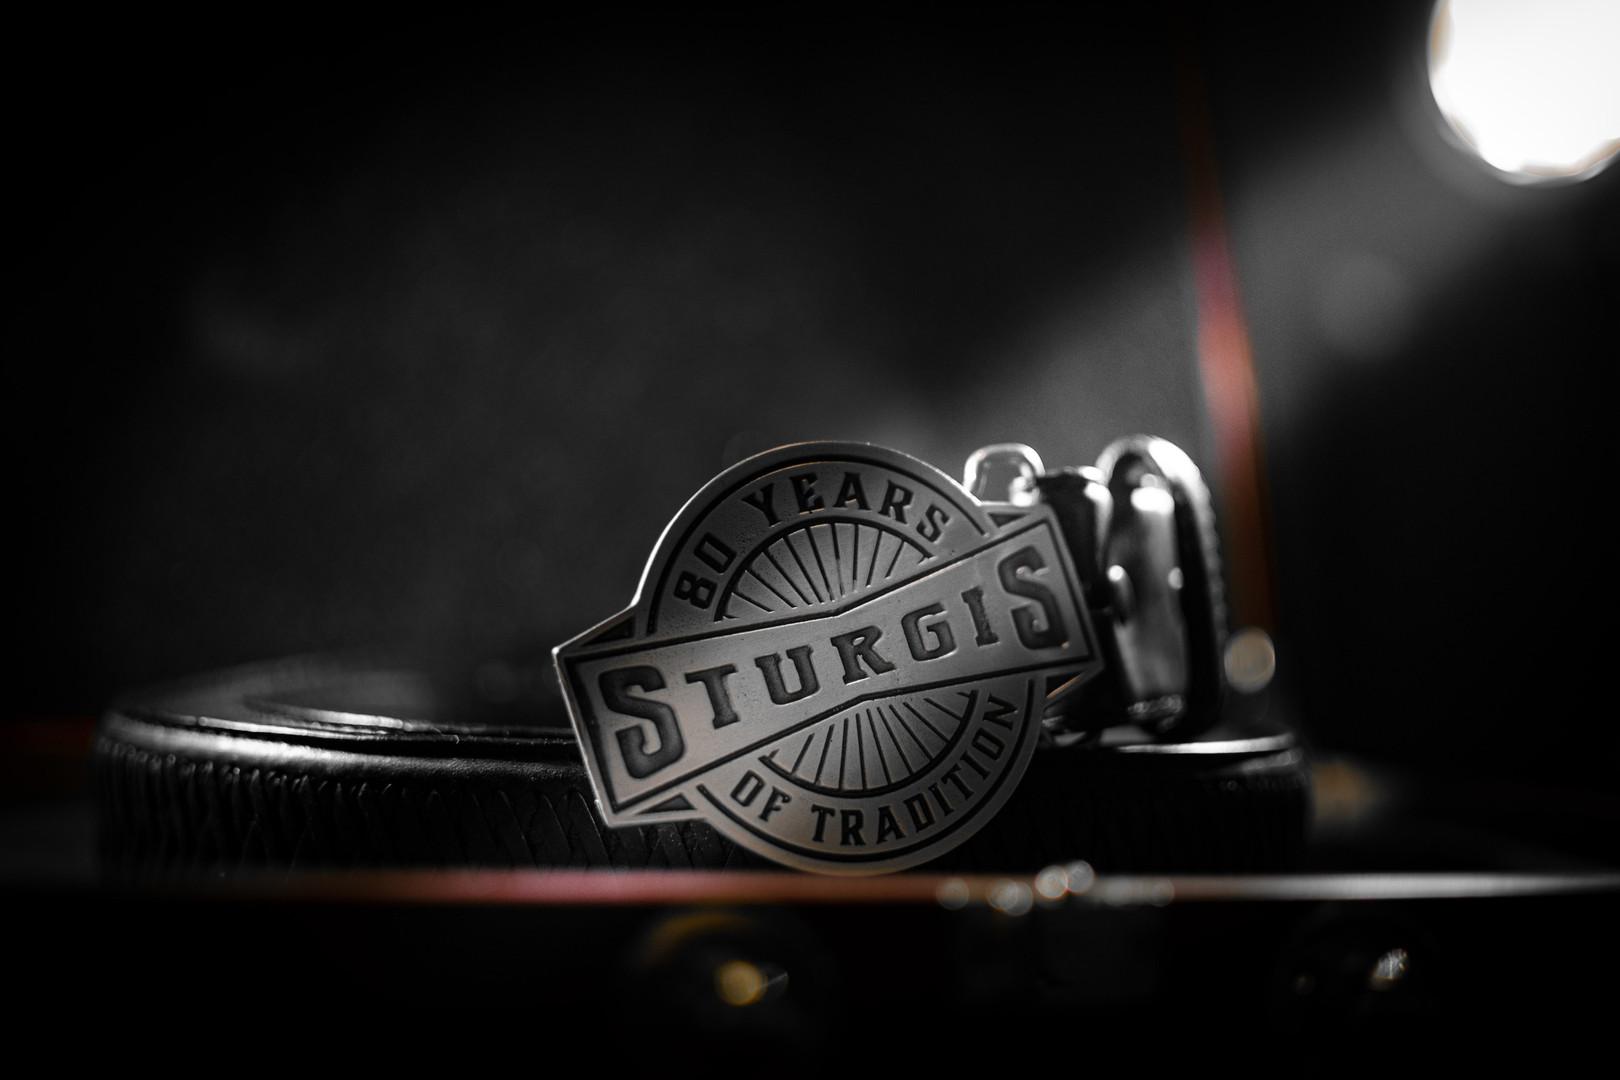 Sturgis 8th Buckle